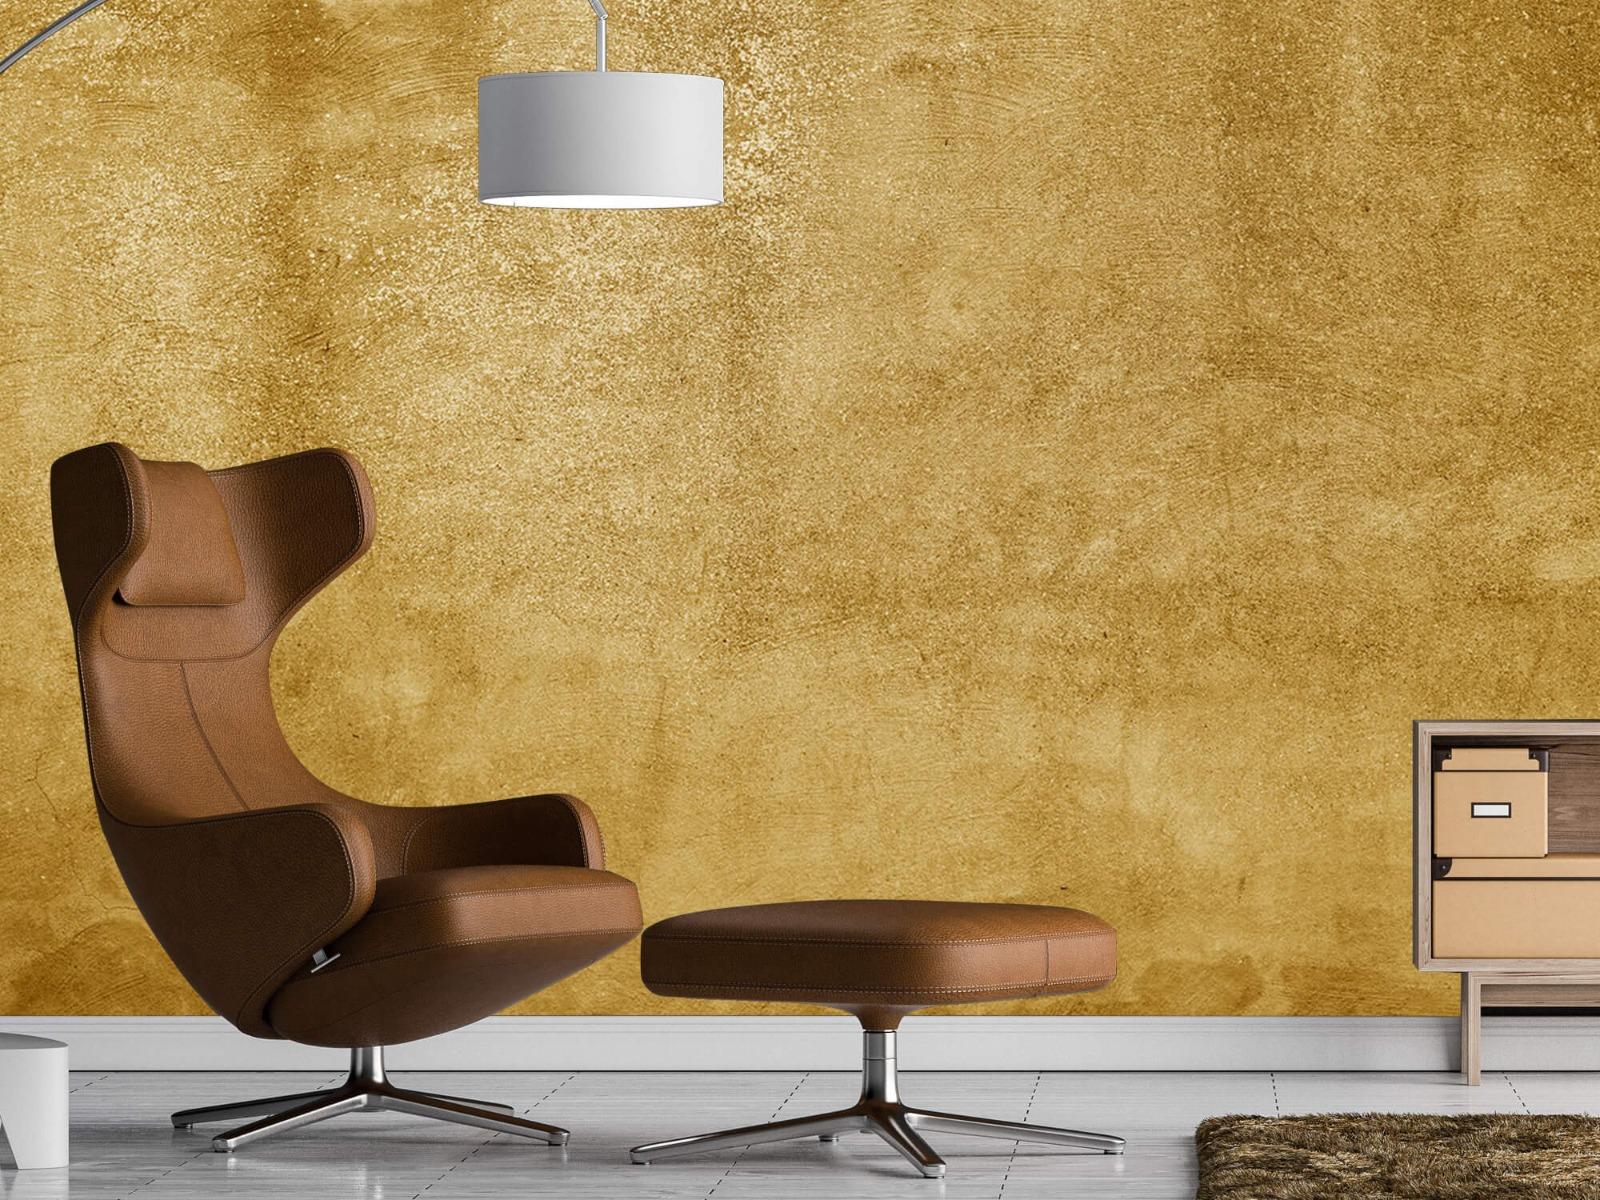 Betonlook behang - Oker geel beton - Woonkamer 19